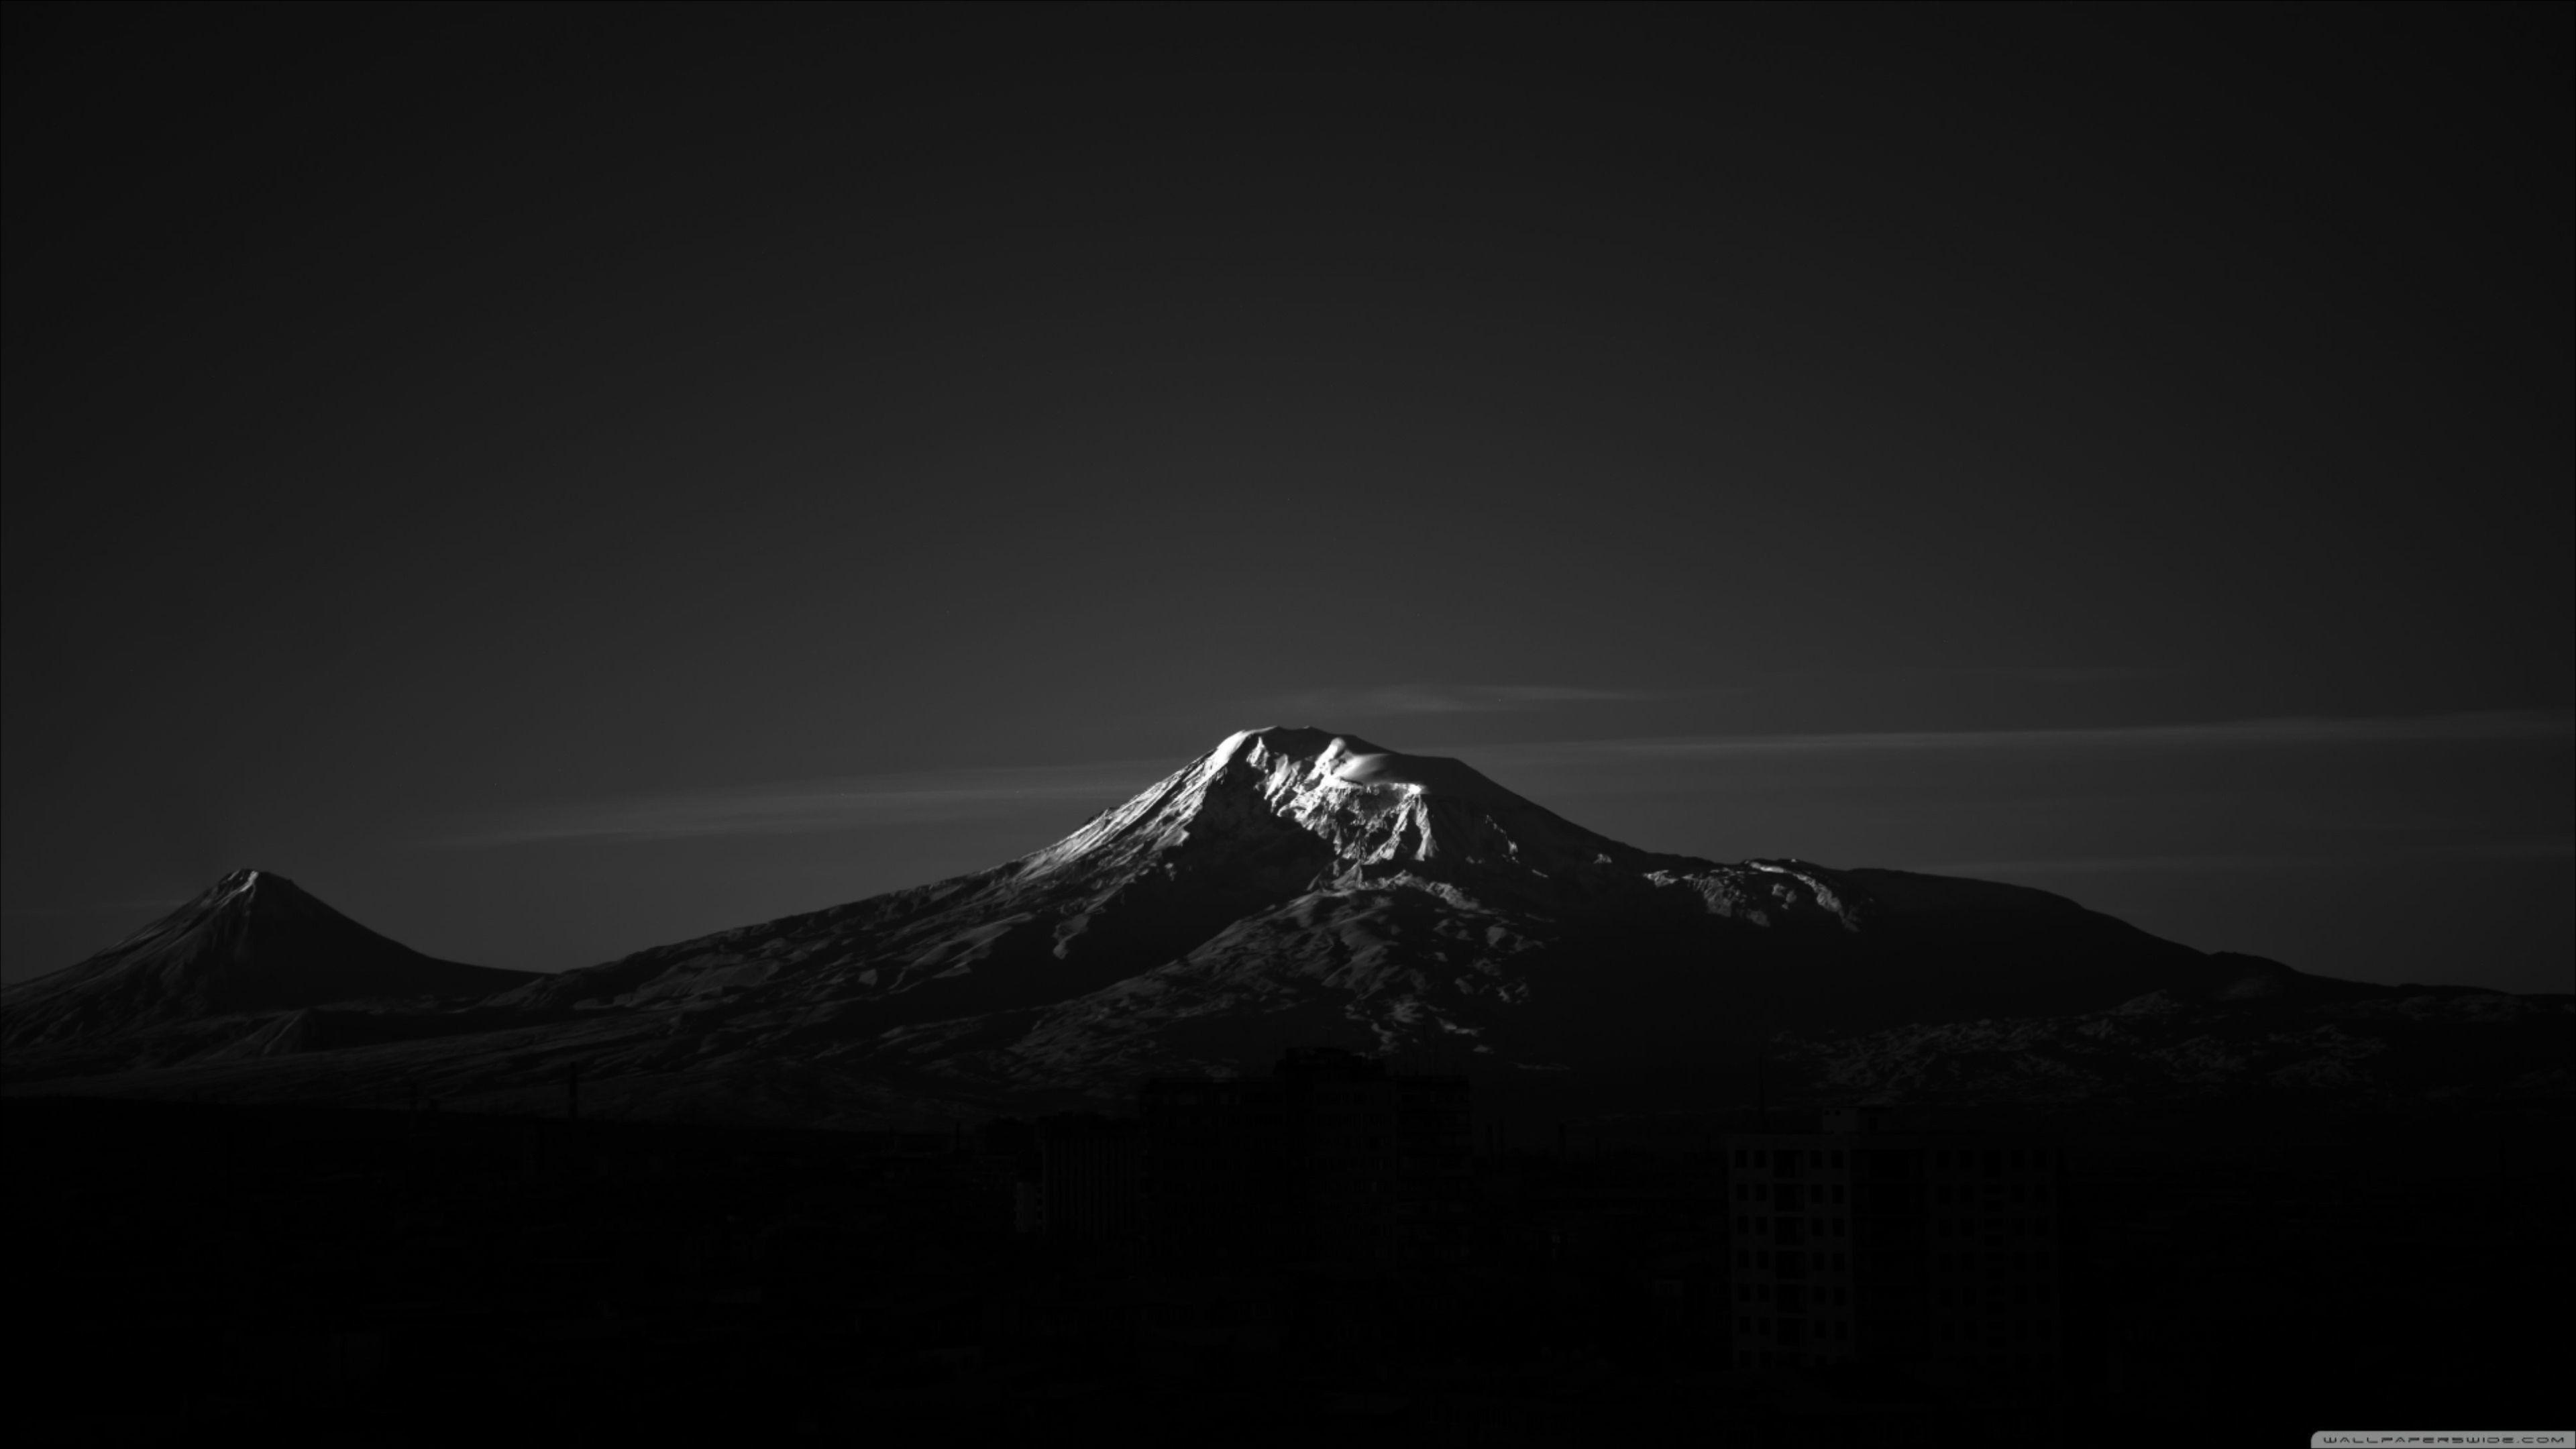 Mountain En 2020 Fond D Ecran Noir Et Blanc Fond D Ecran Pour Ordinateur Ecran Noir Et Blanc